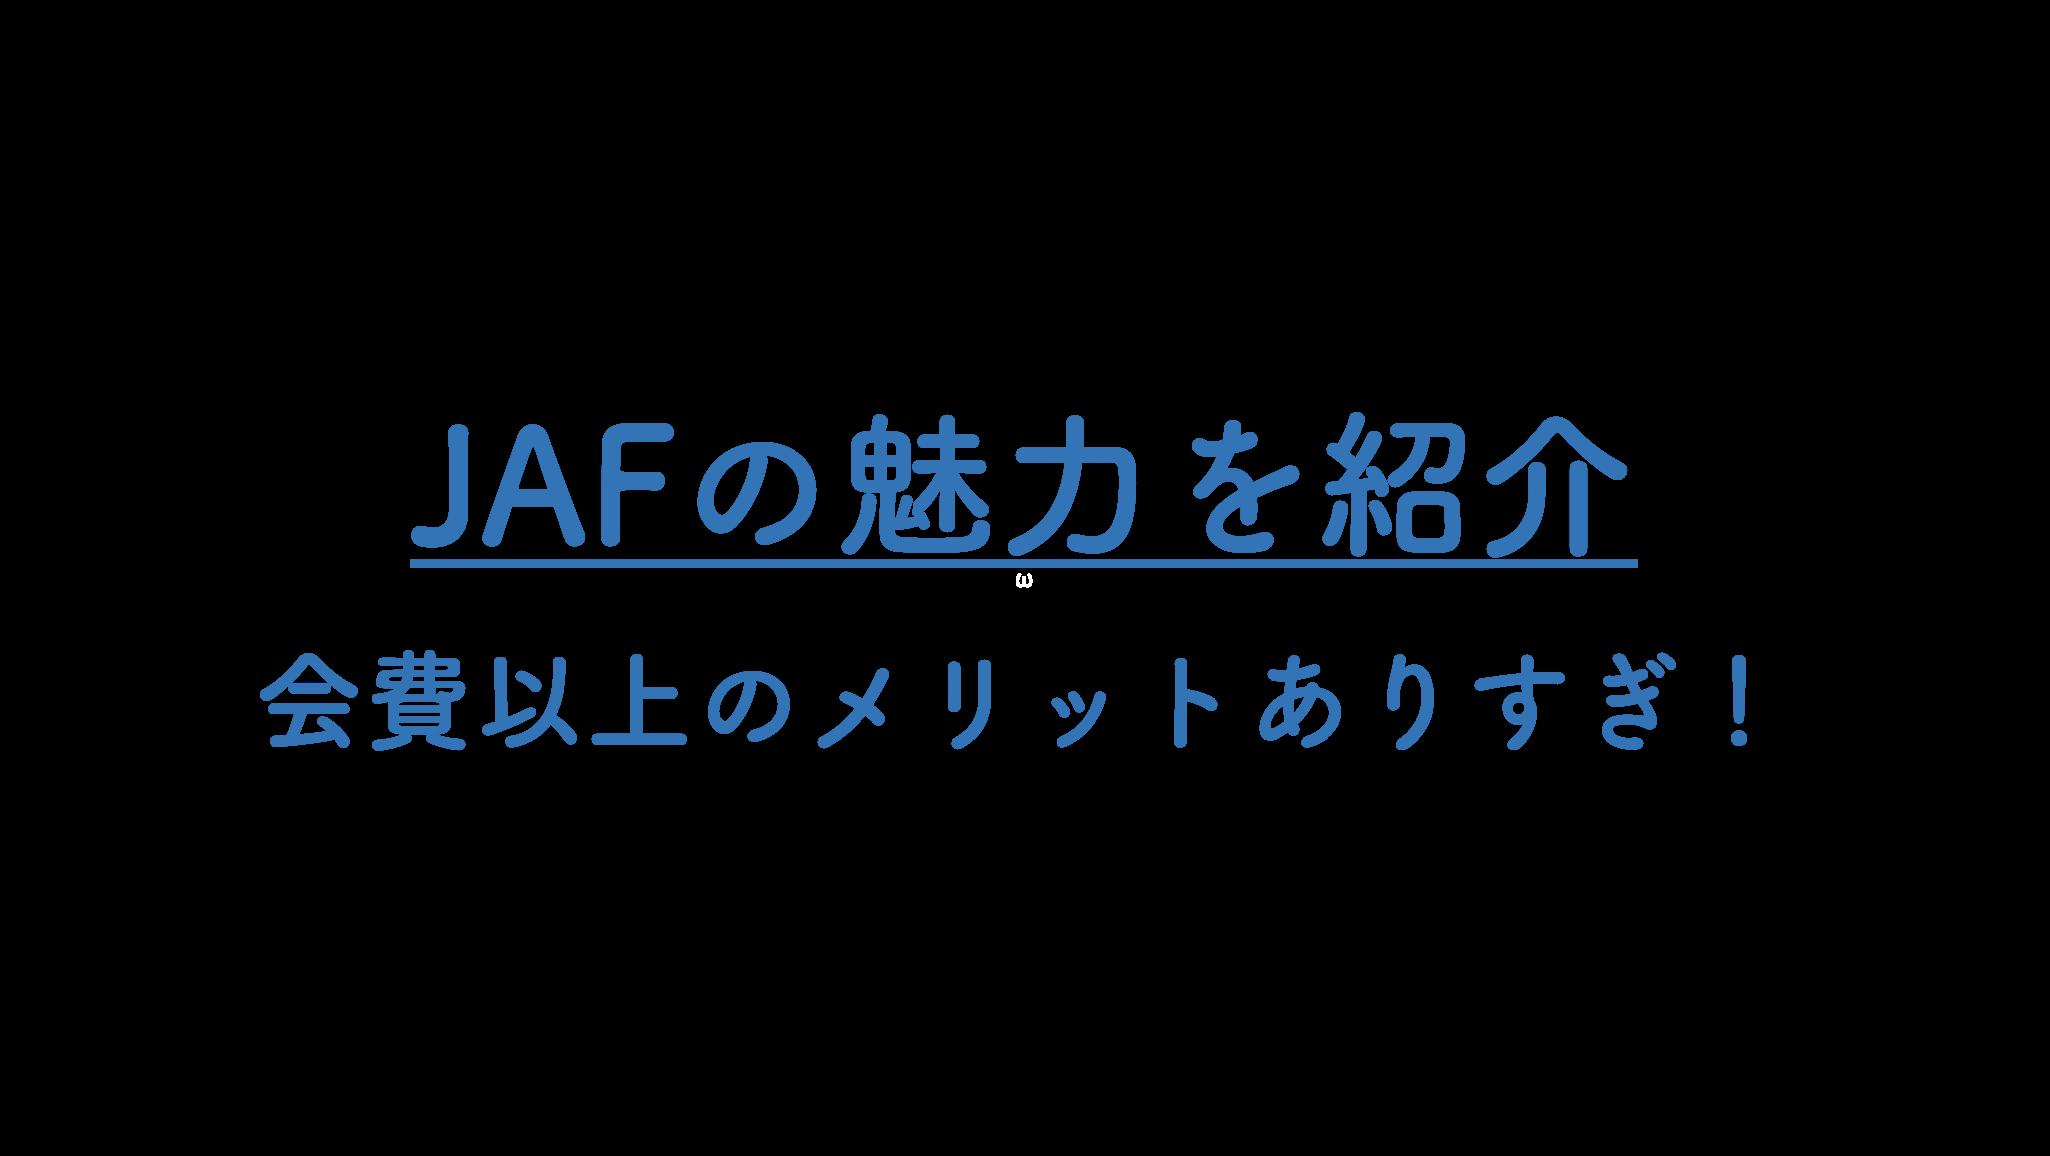 JAF-introduction